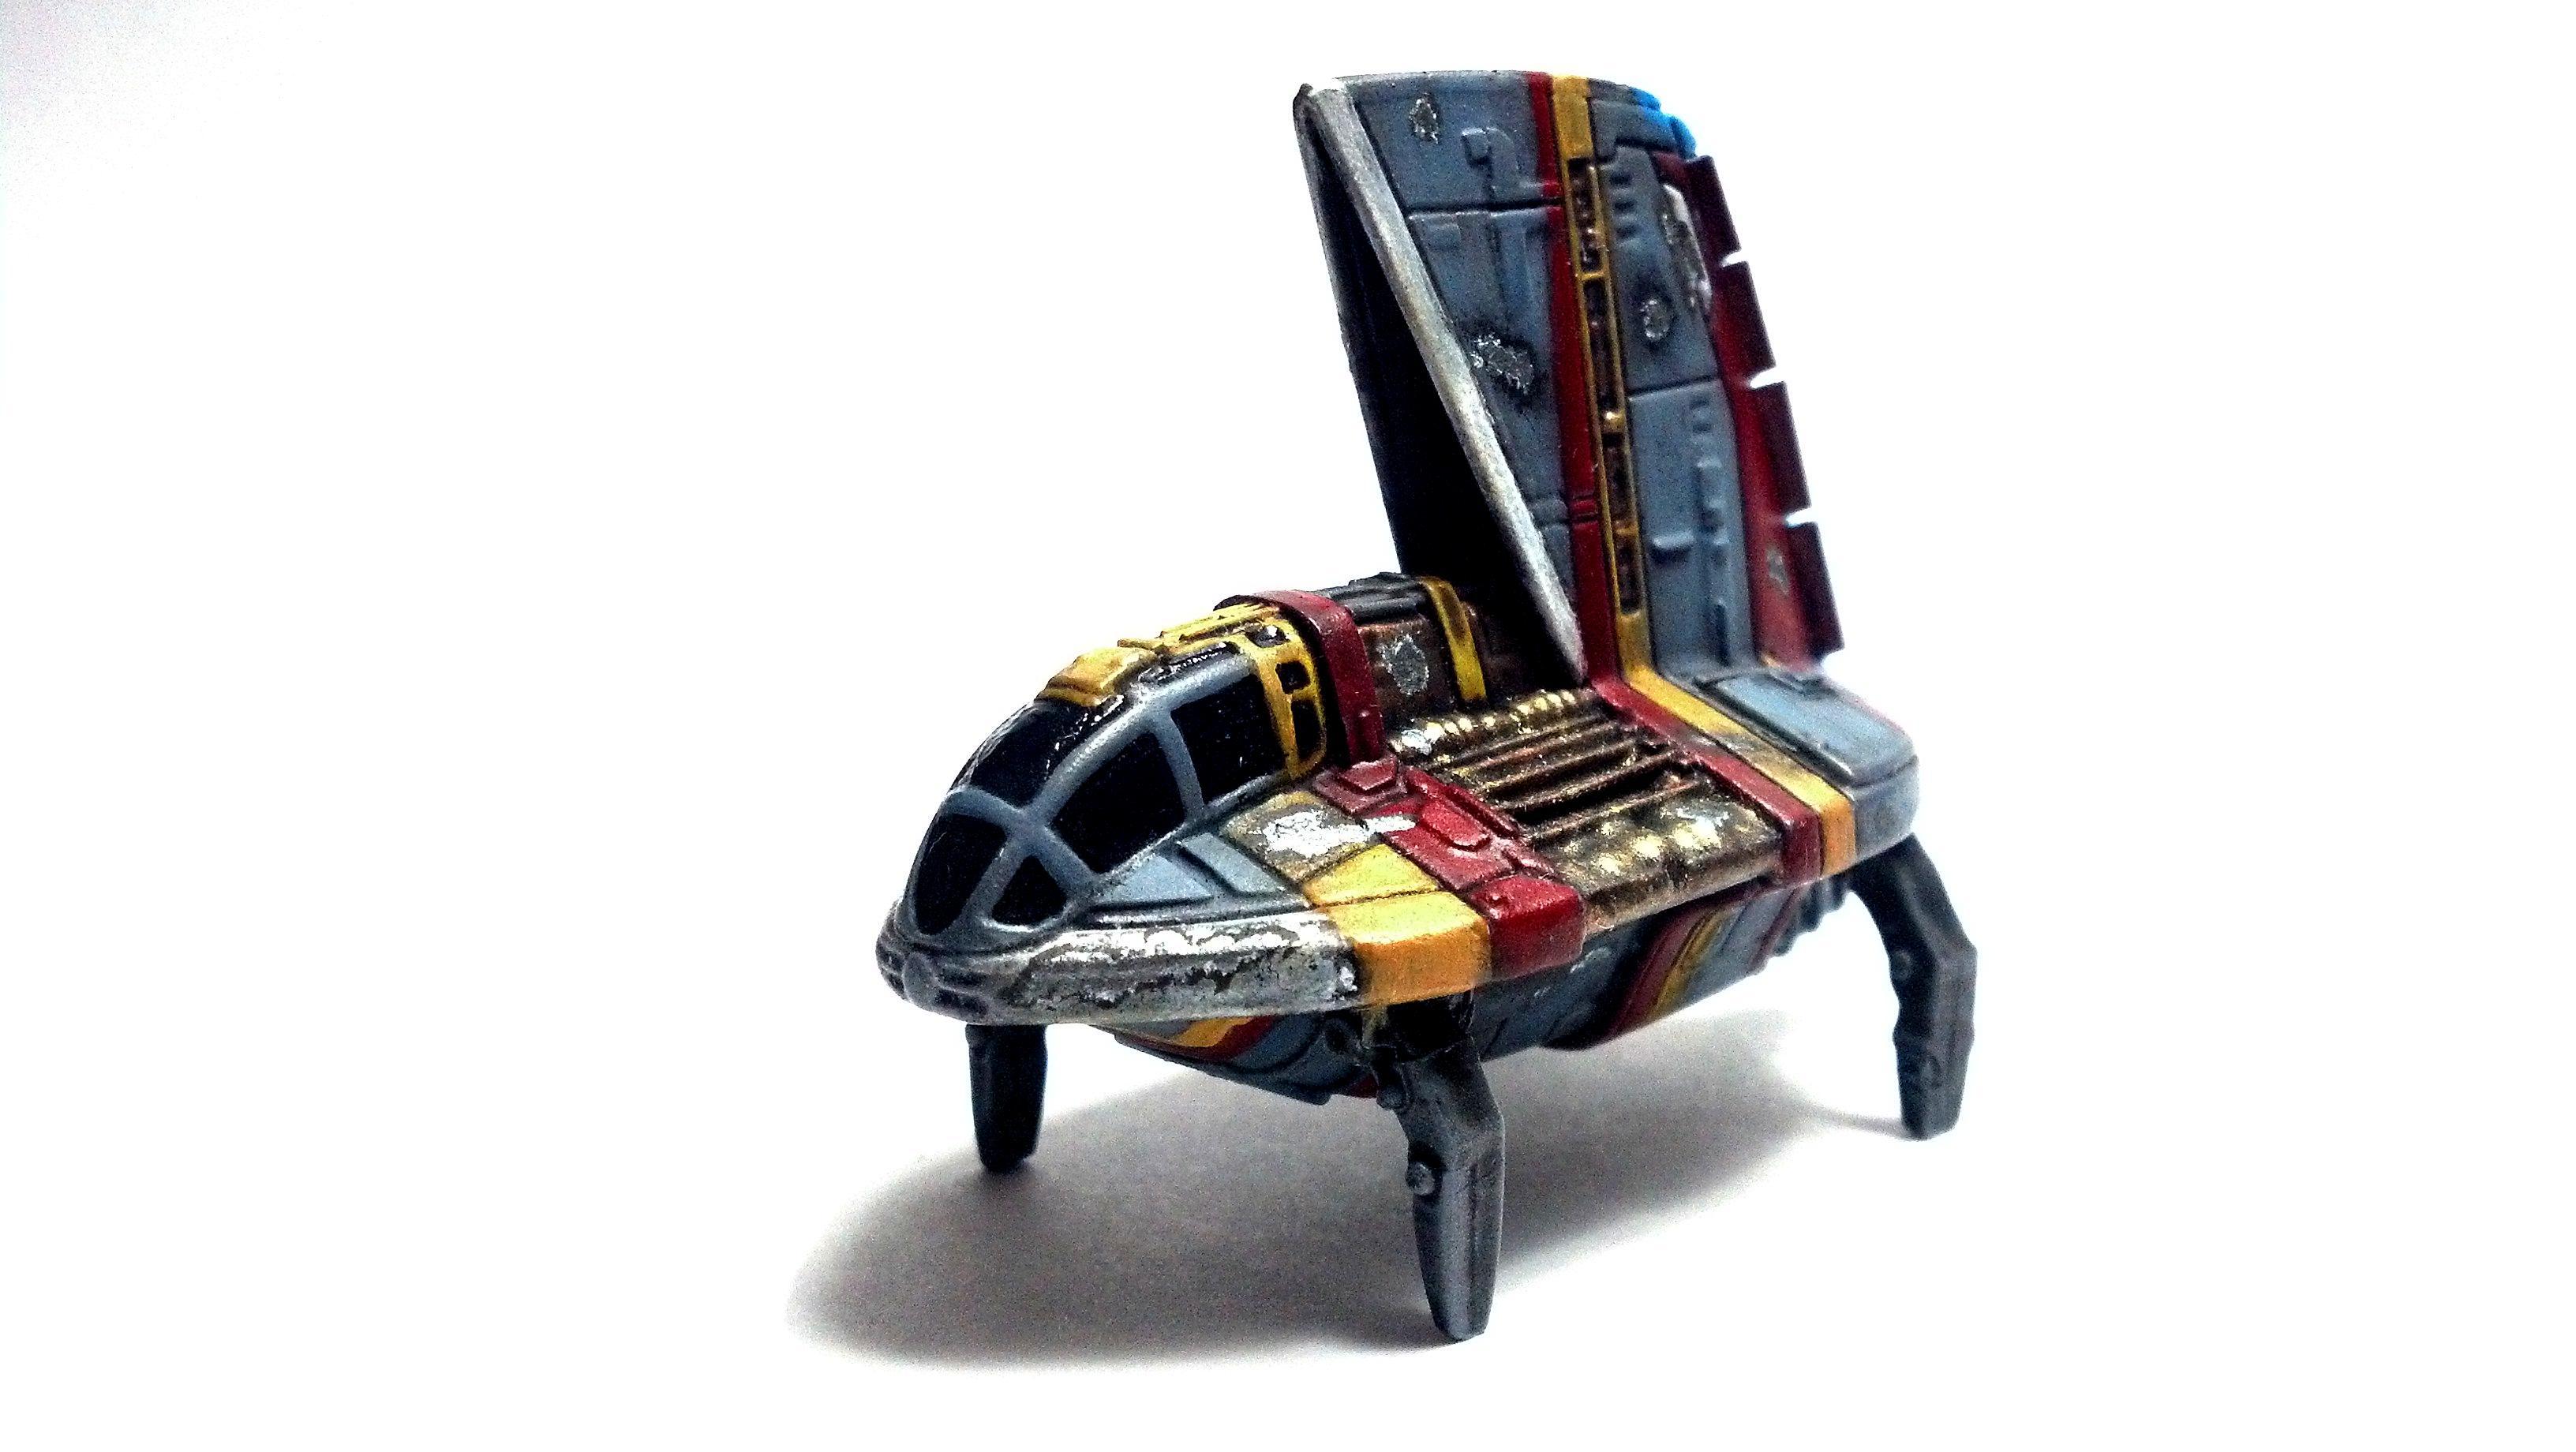 1/270, 1:270, Long Range, Miniature, Modification, Neimoidian Shuttle, Refueler, Star Wars, X-wing Miniature Board Game